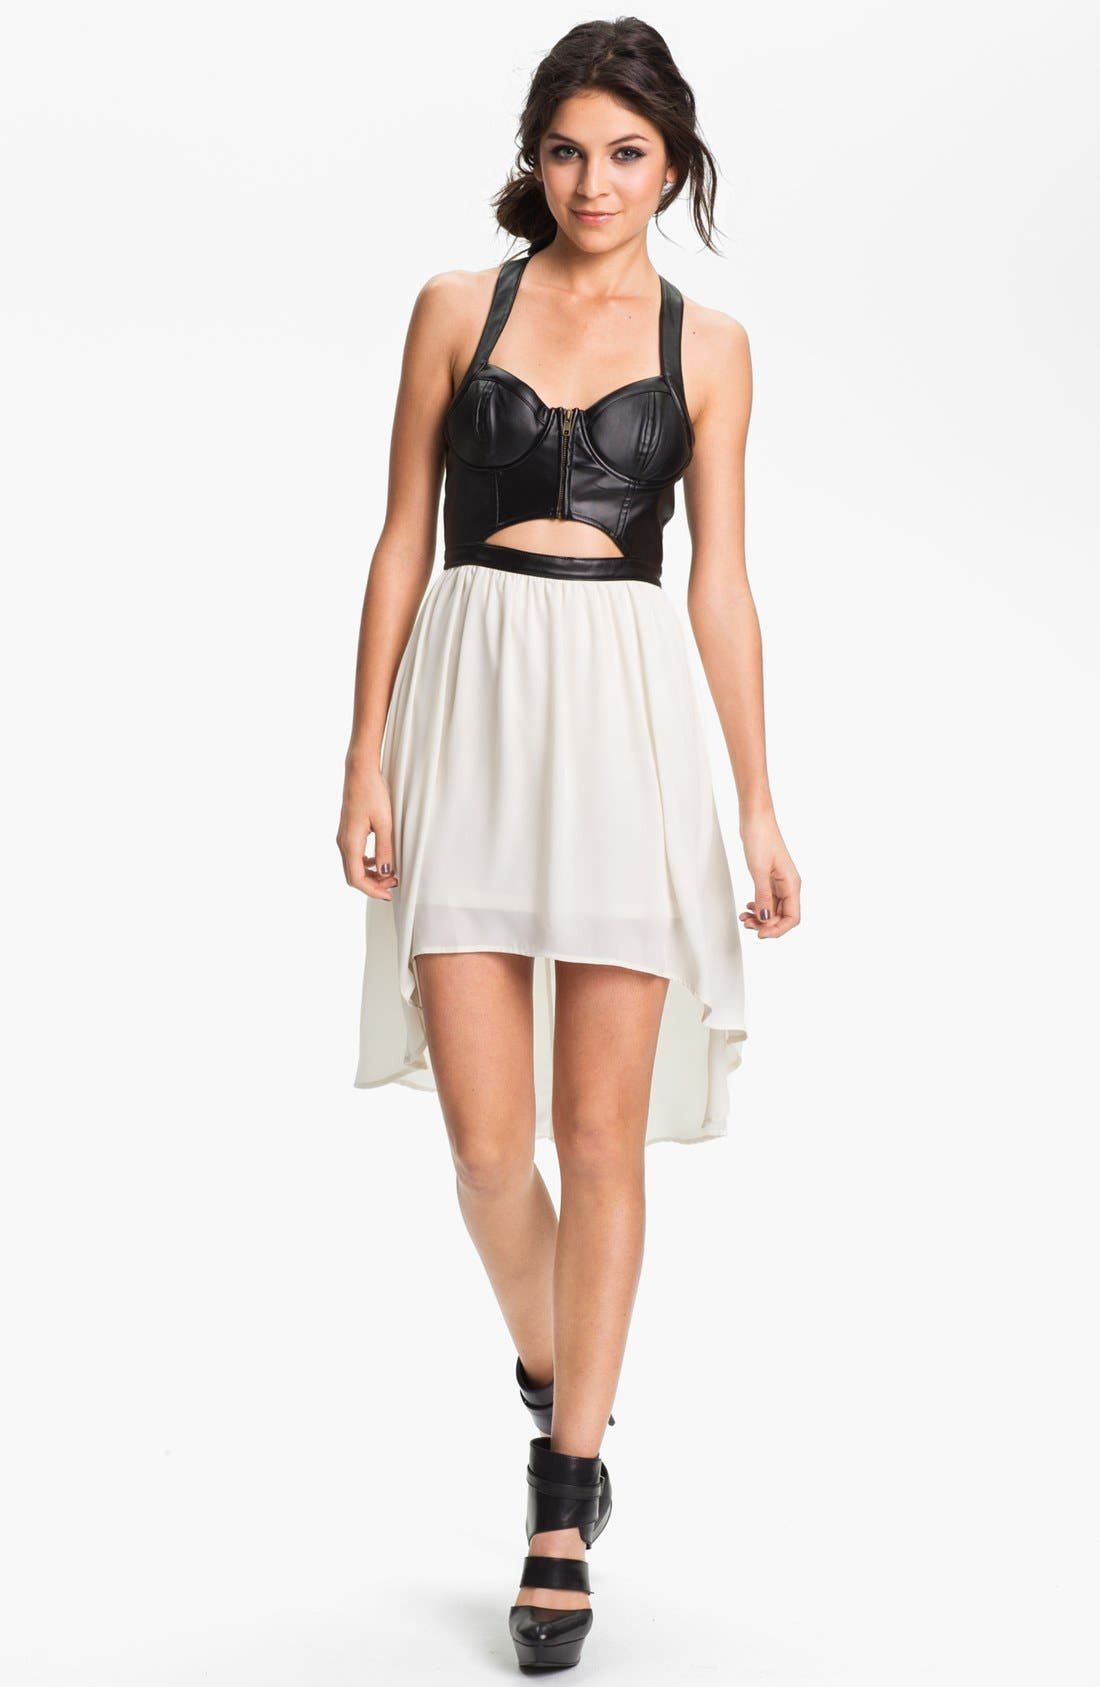 Main Image - Lush Clothing Cutout Faux Leather Bustier Dress (Juniors)